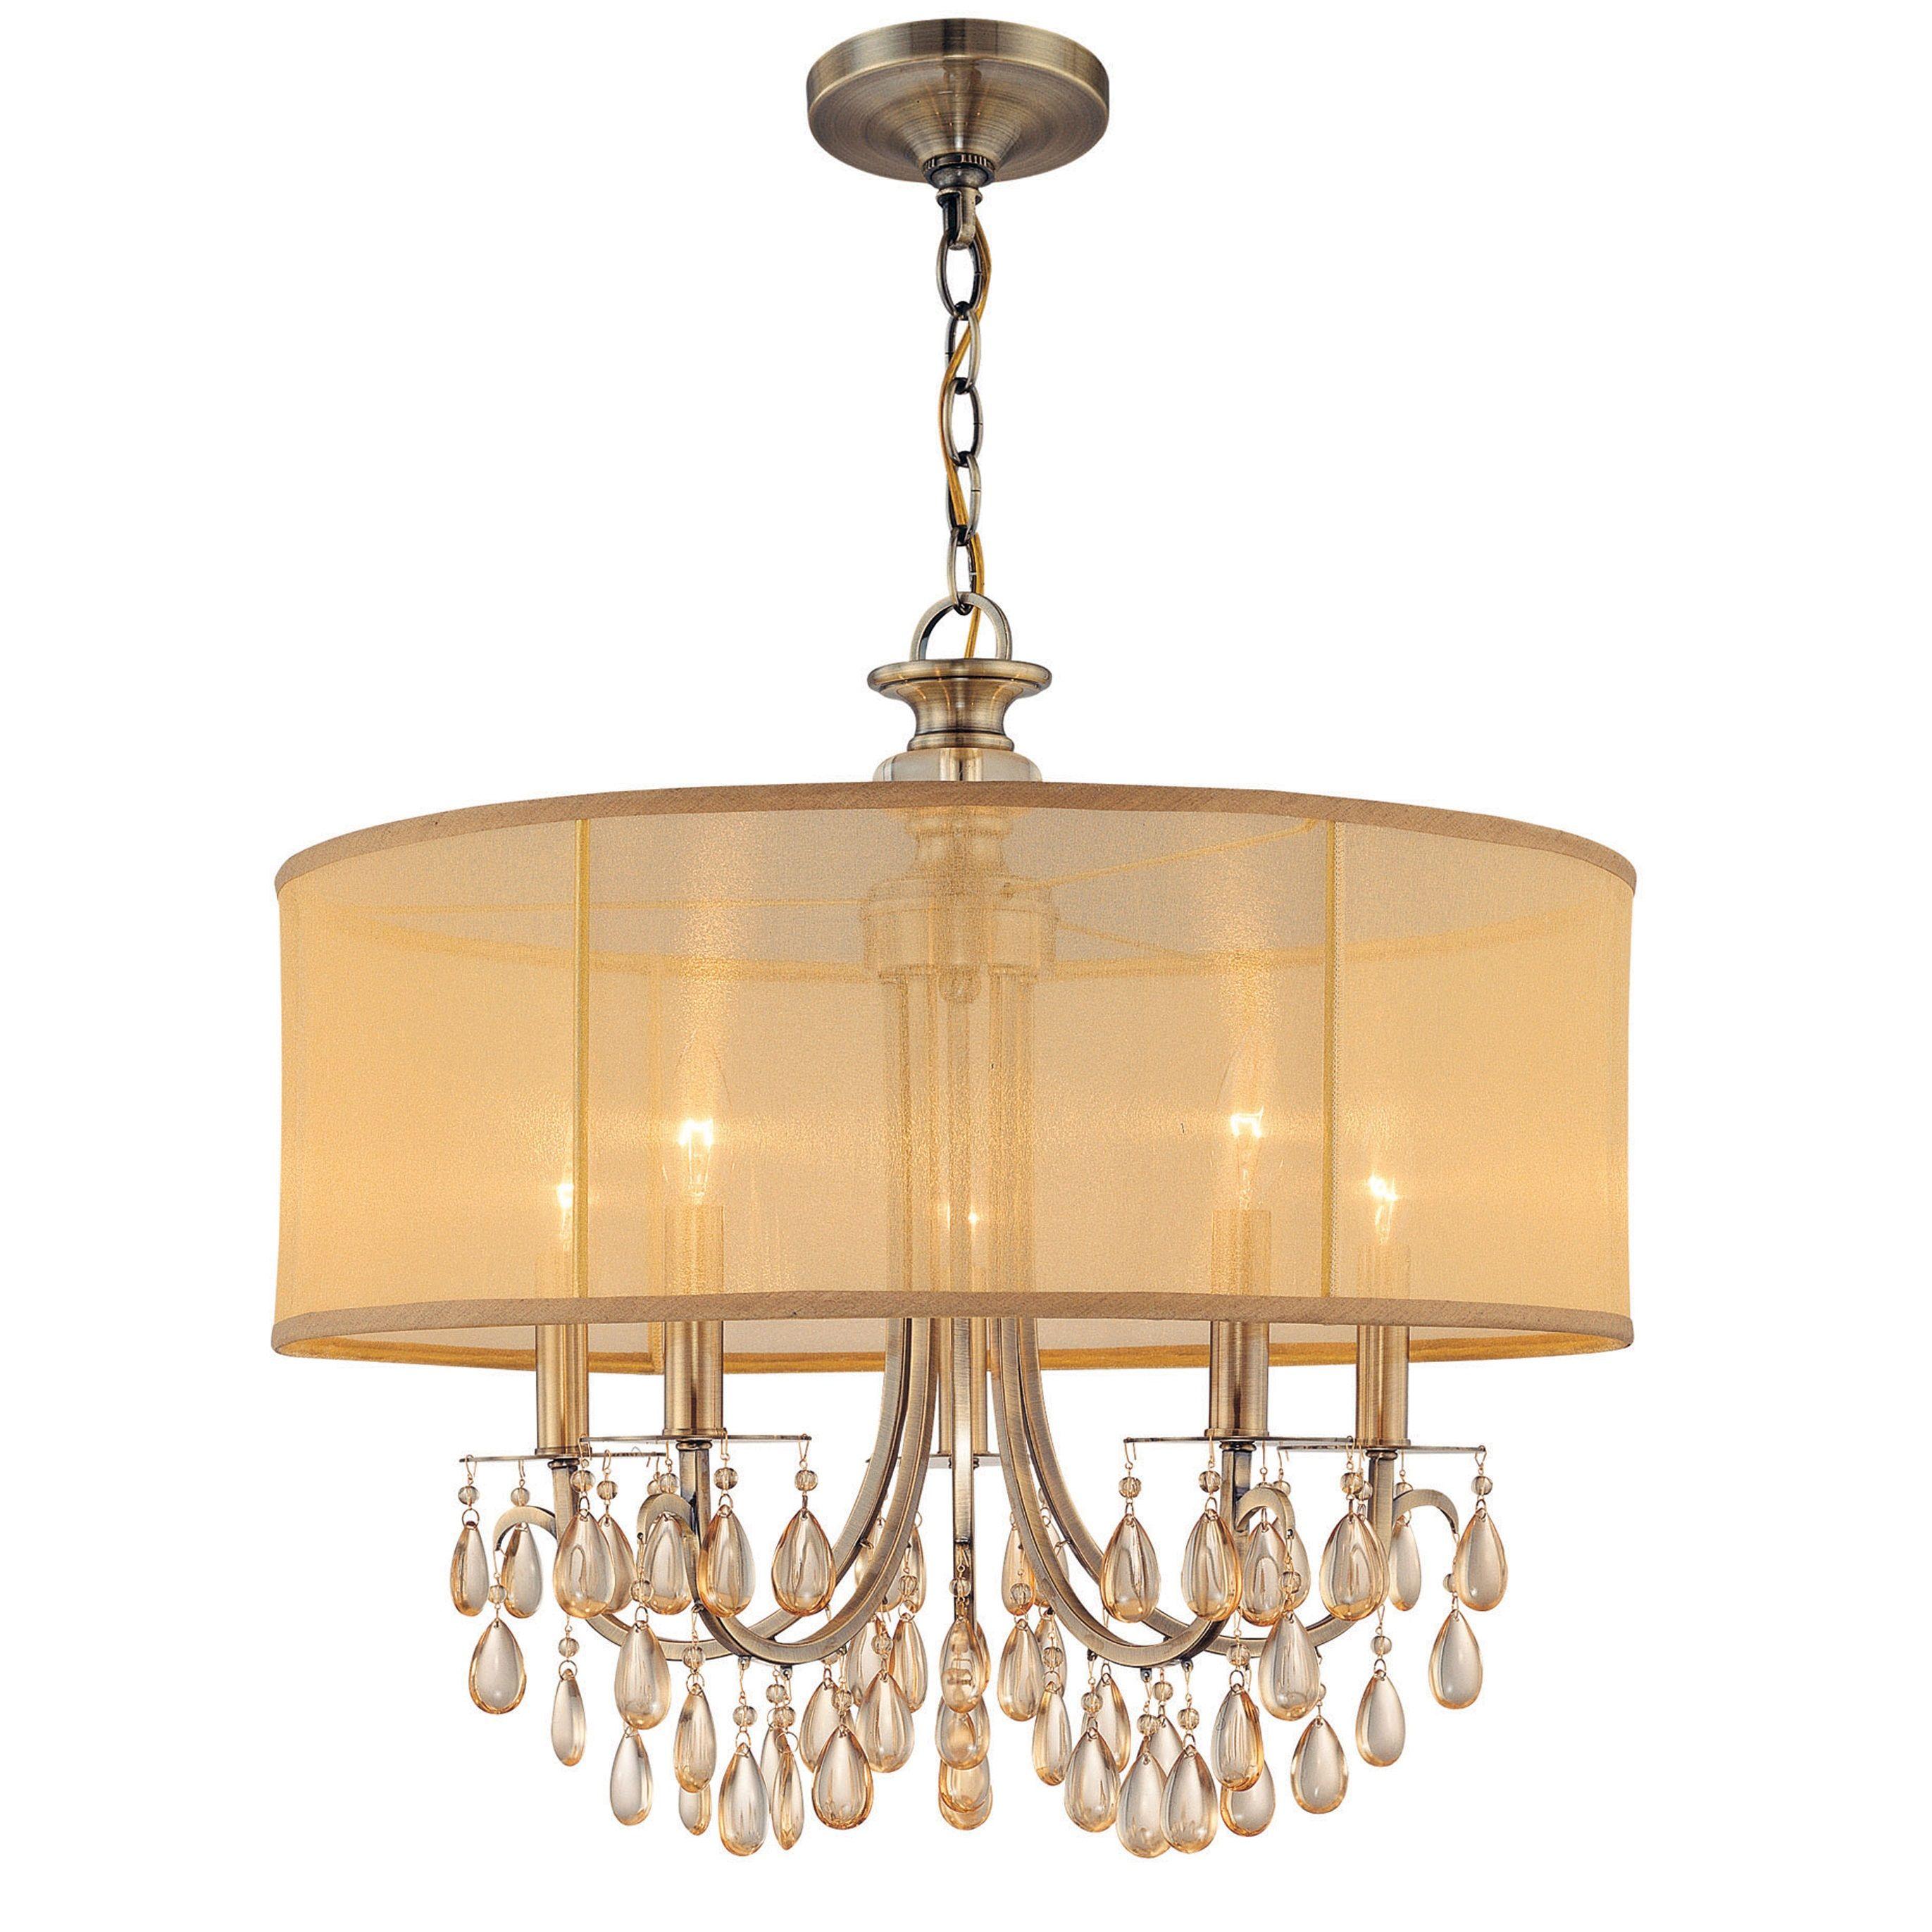 Crystorama Lighting Group 5625 AB Antique Brass Hampton 5 Light 24